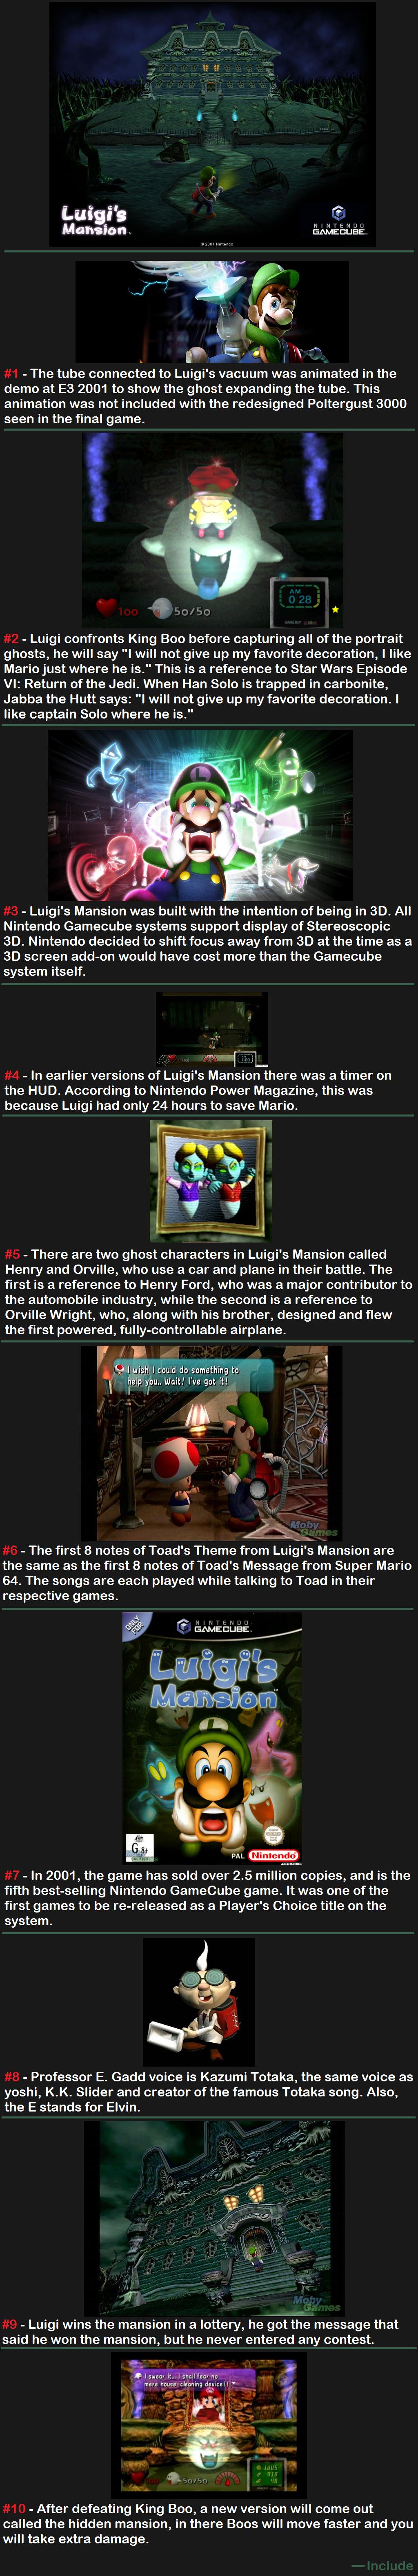 Luigi's Mansion. Dead space - www.funnyjunk.com/channel/comp-channel/Dead+Space/jnBMLwa/ Super Mario Sunshine - www.funnyjunk.com/channel/comp-channel/Super+Mar